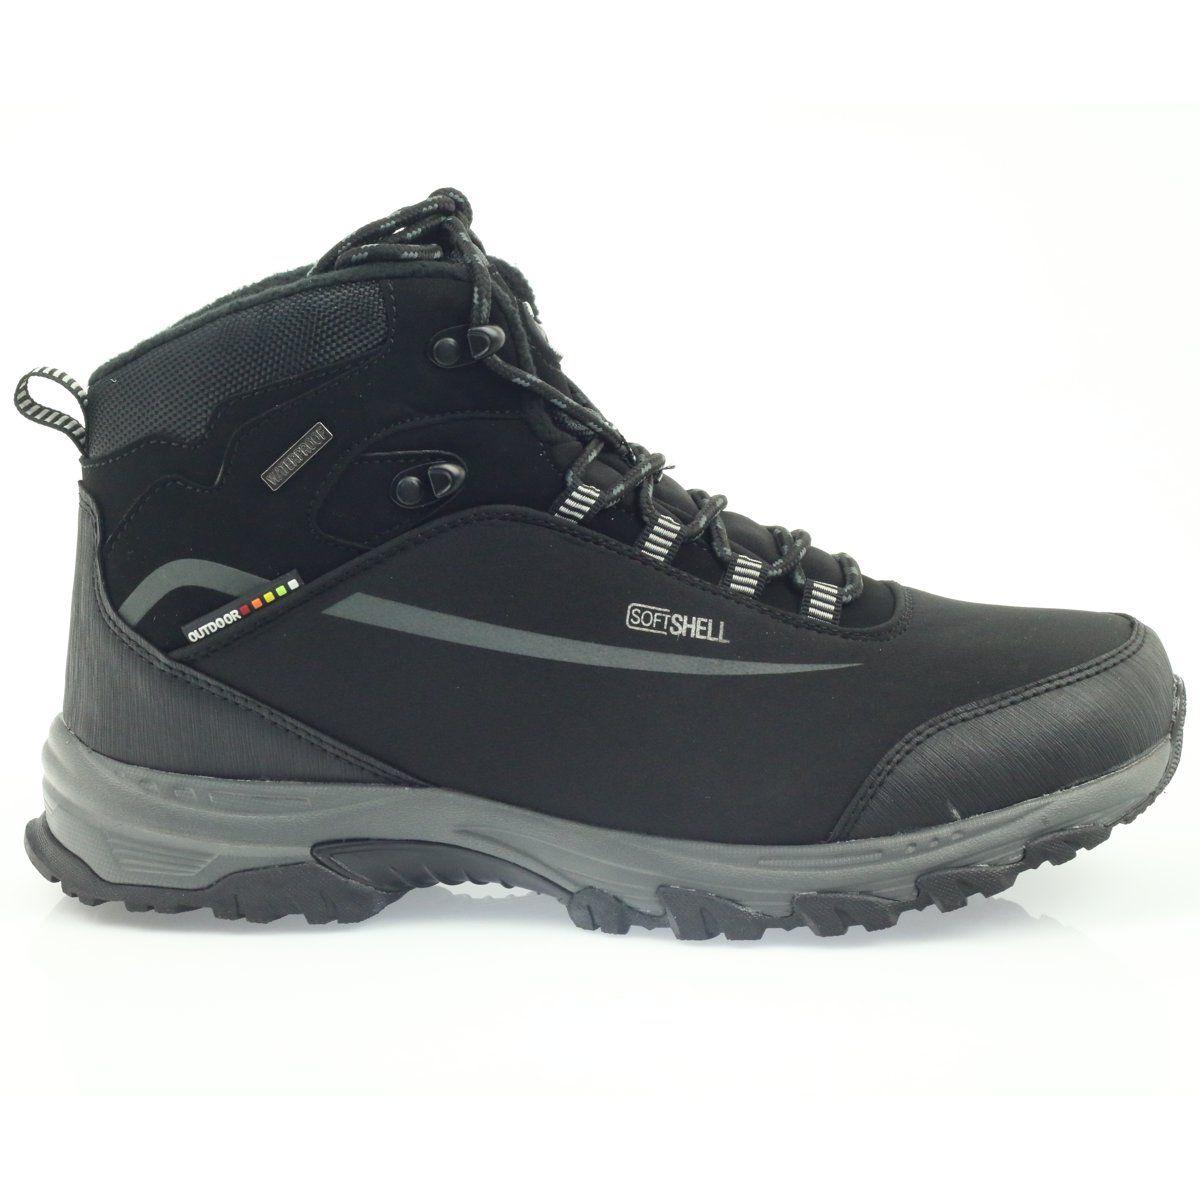 American Club American Trekkingi Buty Zimowe Z Membrana Czarne Softshell Boots Hiking Boots